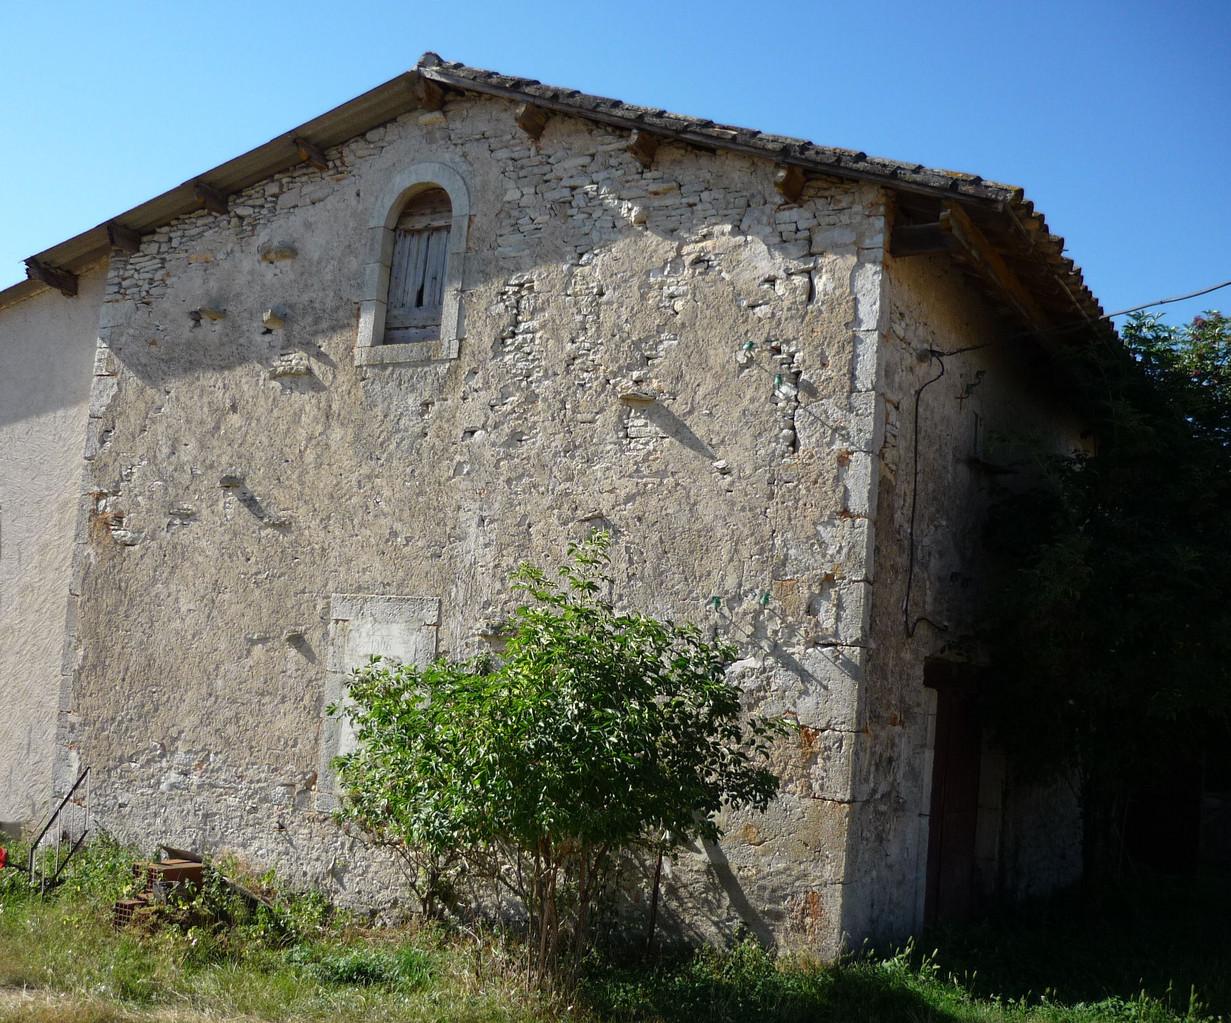 GRANGE, ANCIEN PRIEURE